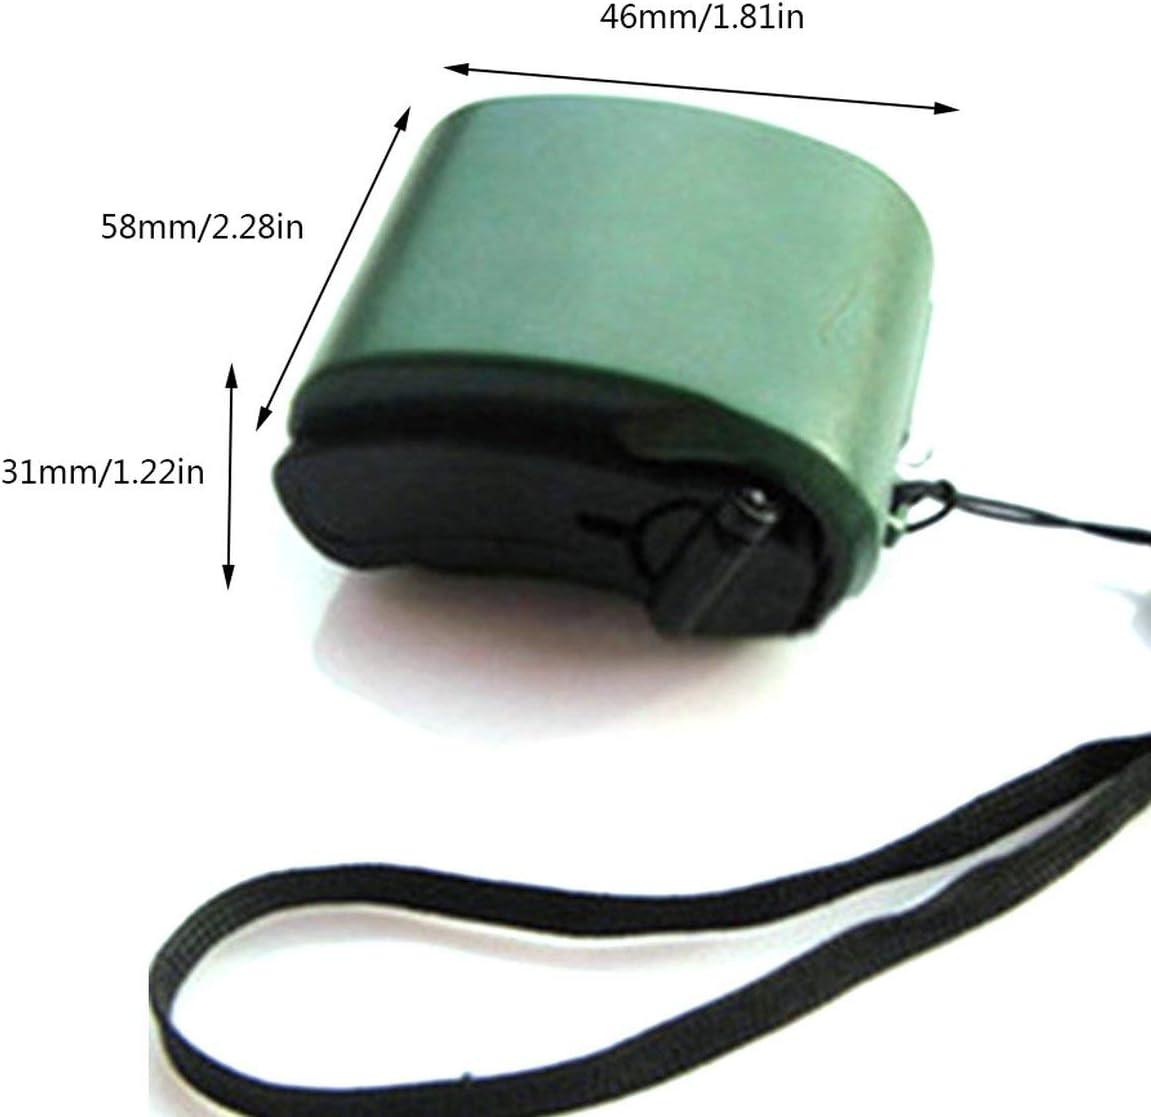 Camp Bedding Sleeping Bag Accessories Liobaba USB Radio Flashlight ...